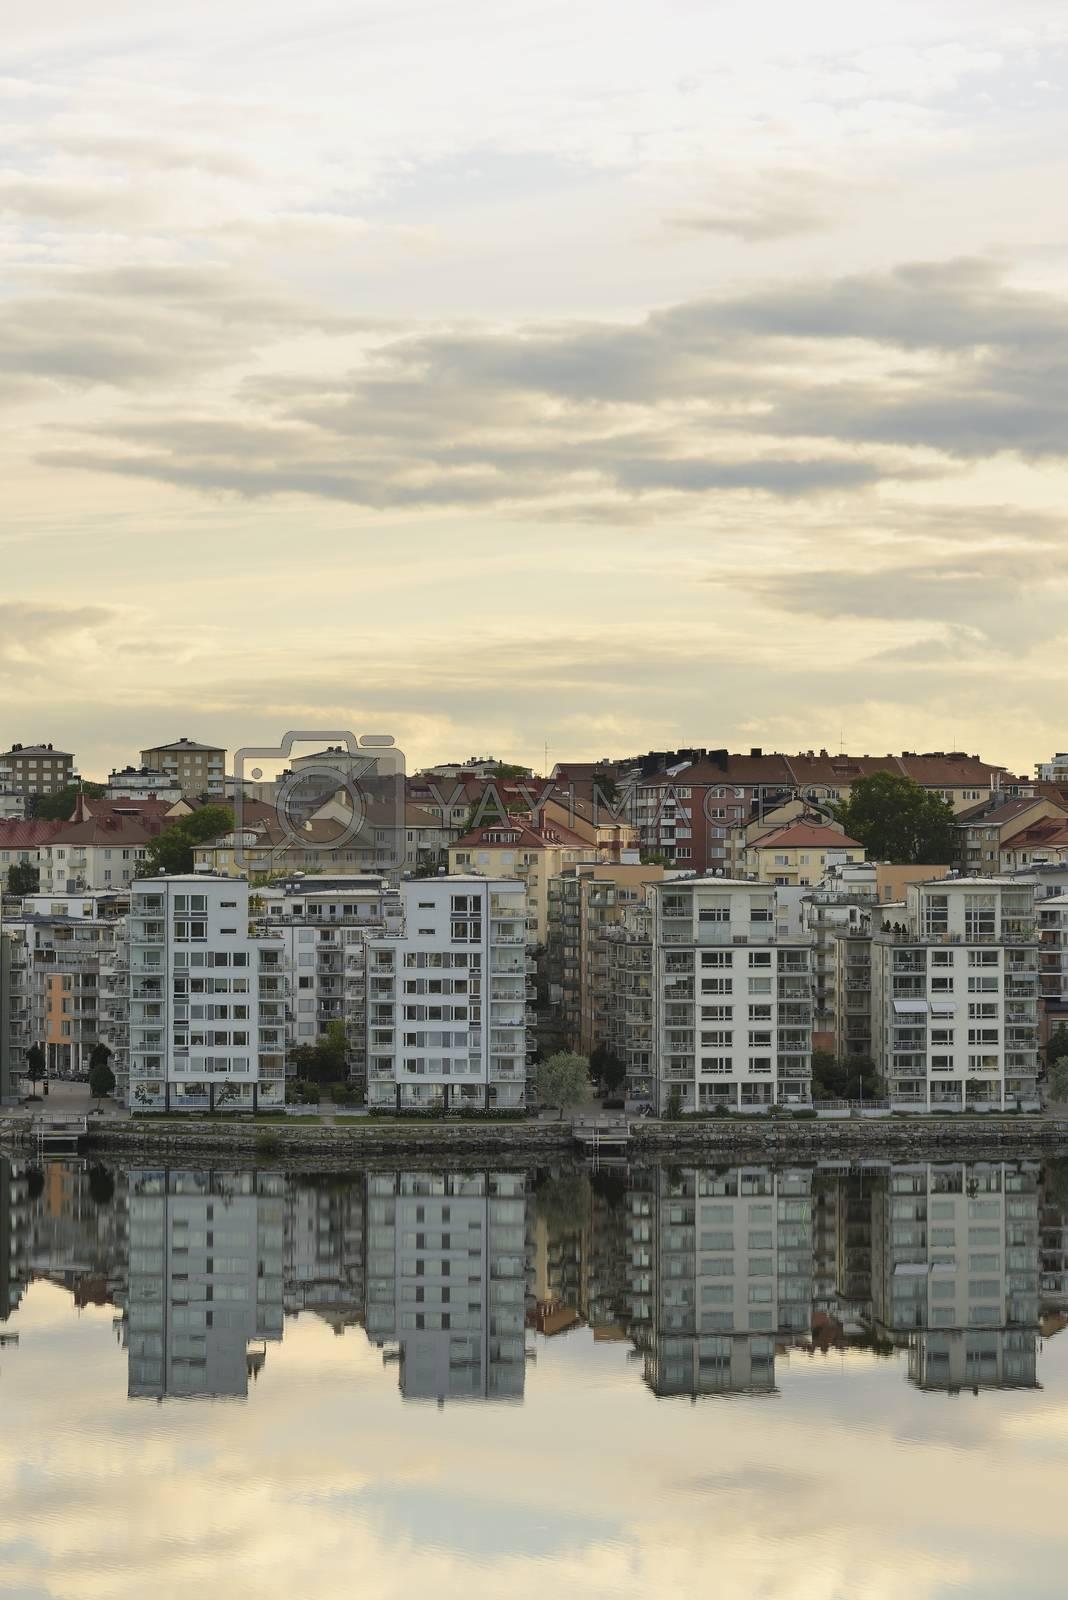 Stockholm embankment